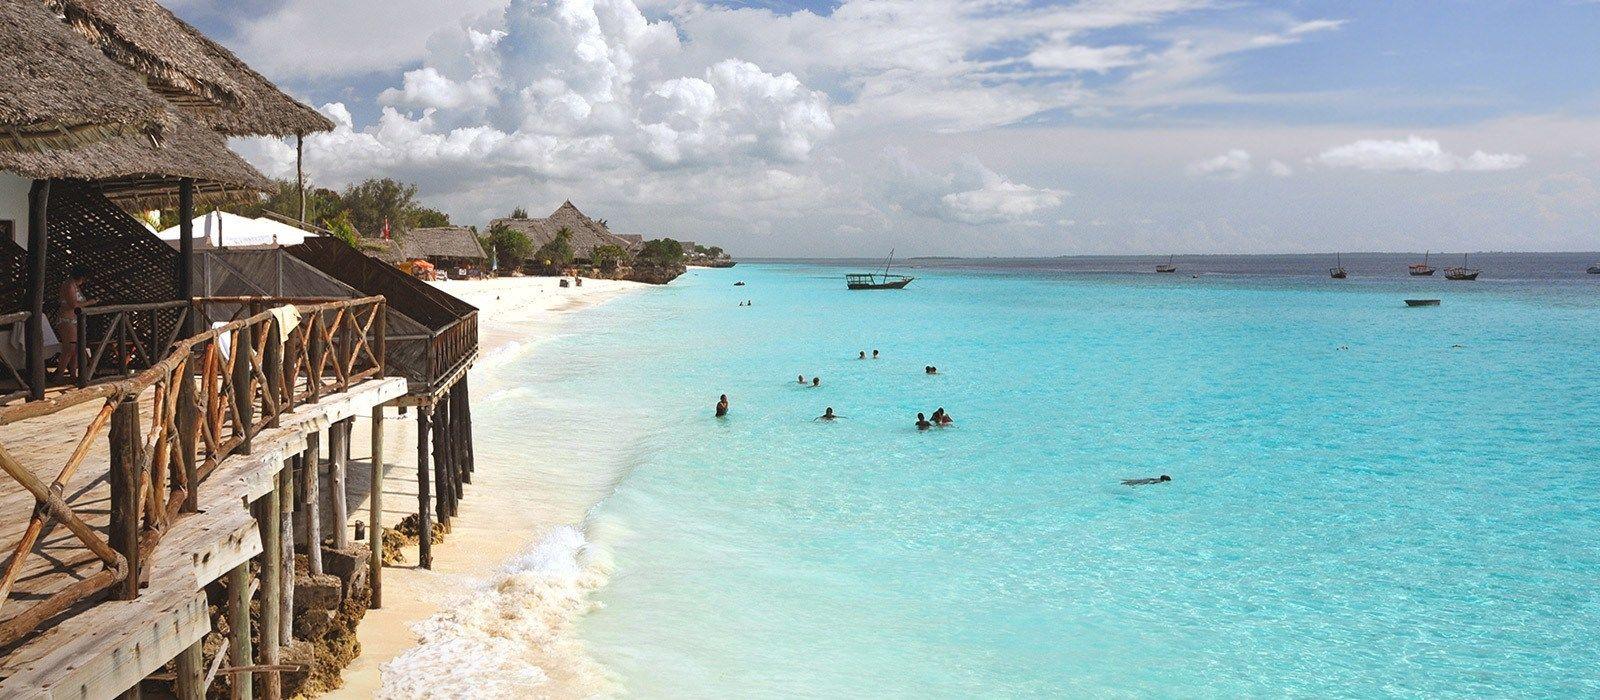 Tansania: Spannende Safaris & romantischer Sansibar Urlaub Urlaub 2